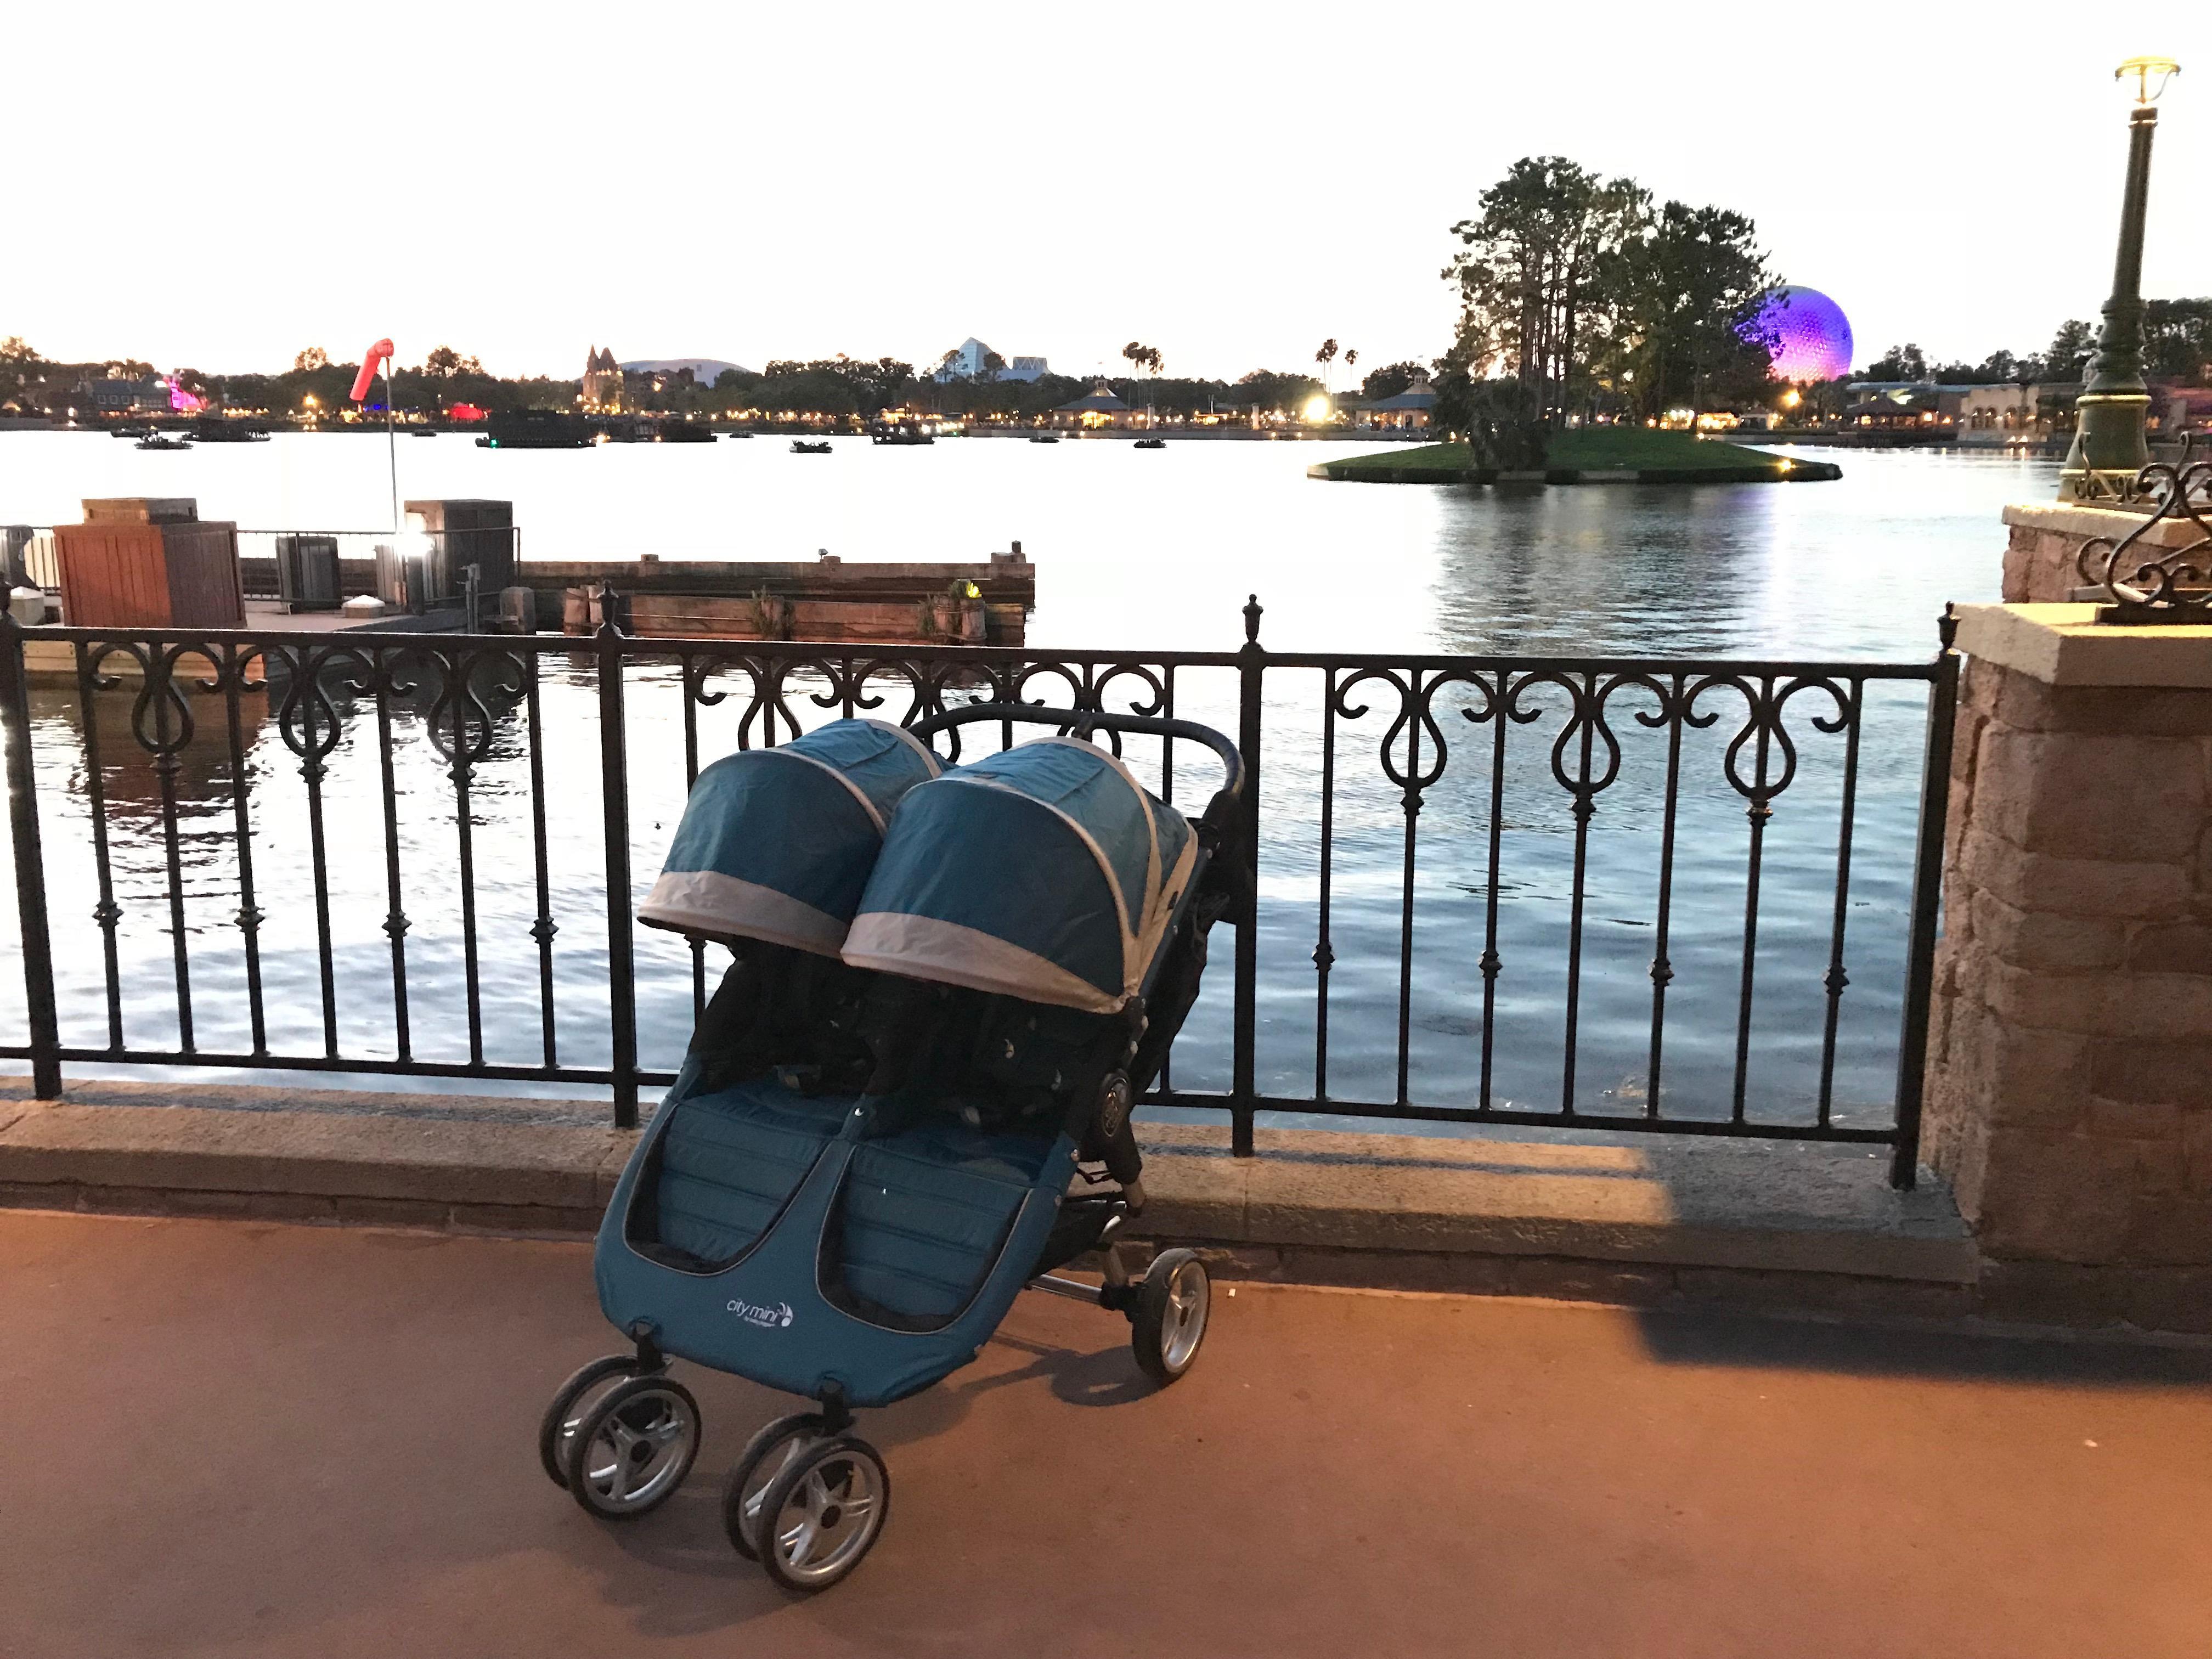 Stroller Rentals Disney image 38